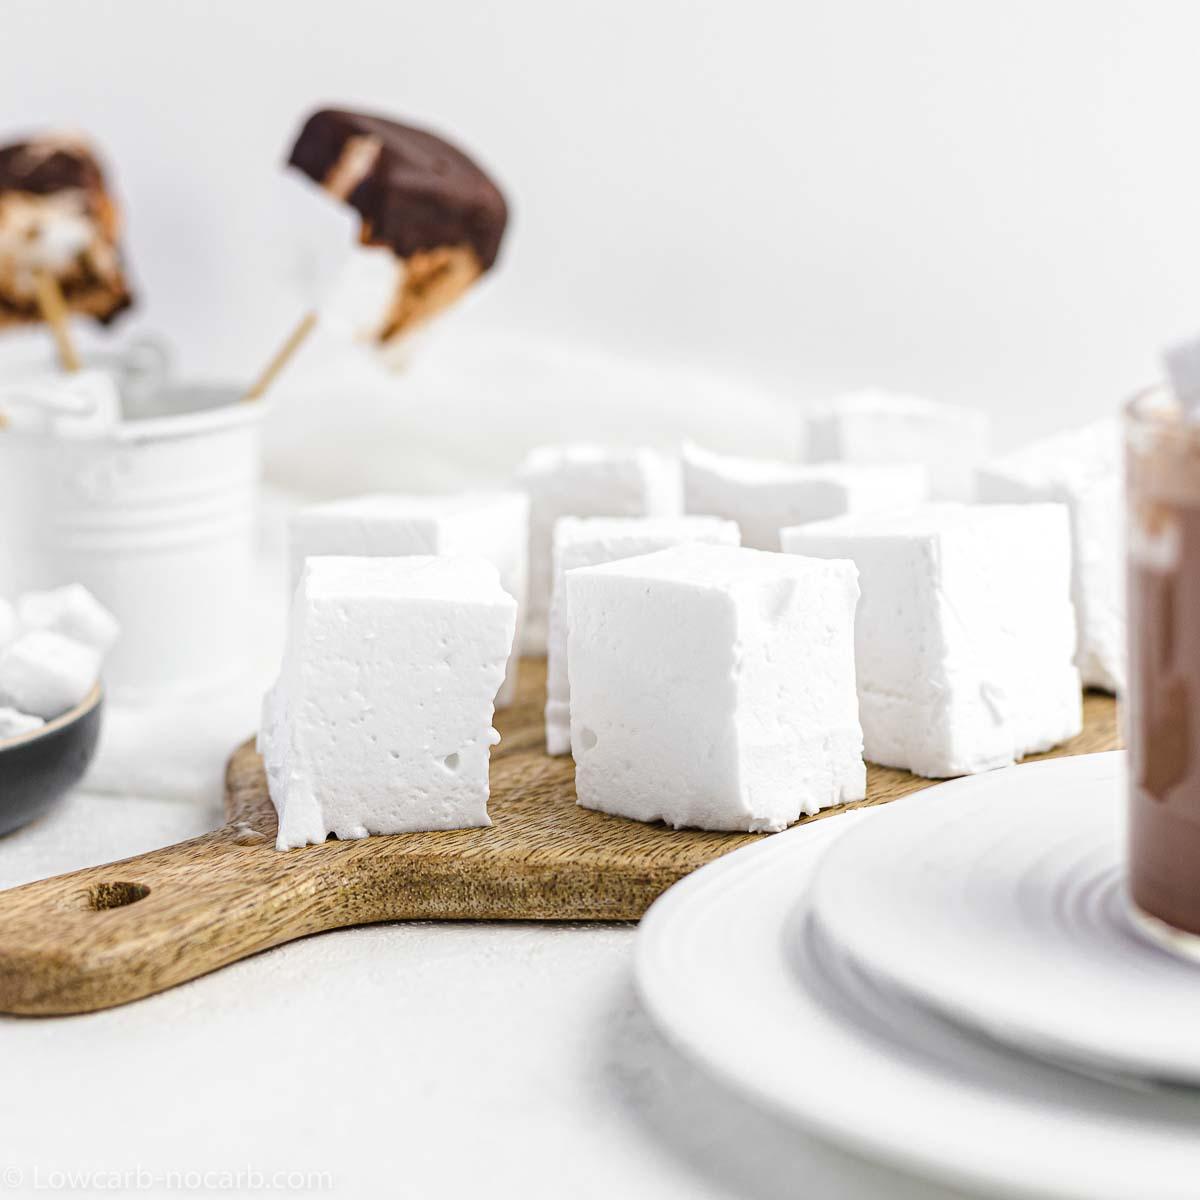 Sugar-Free Marshmallows on a wooden board